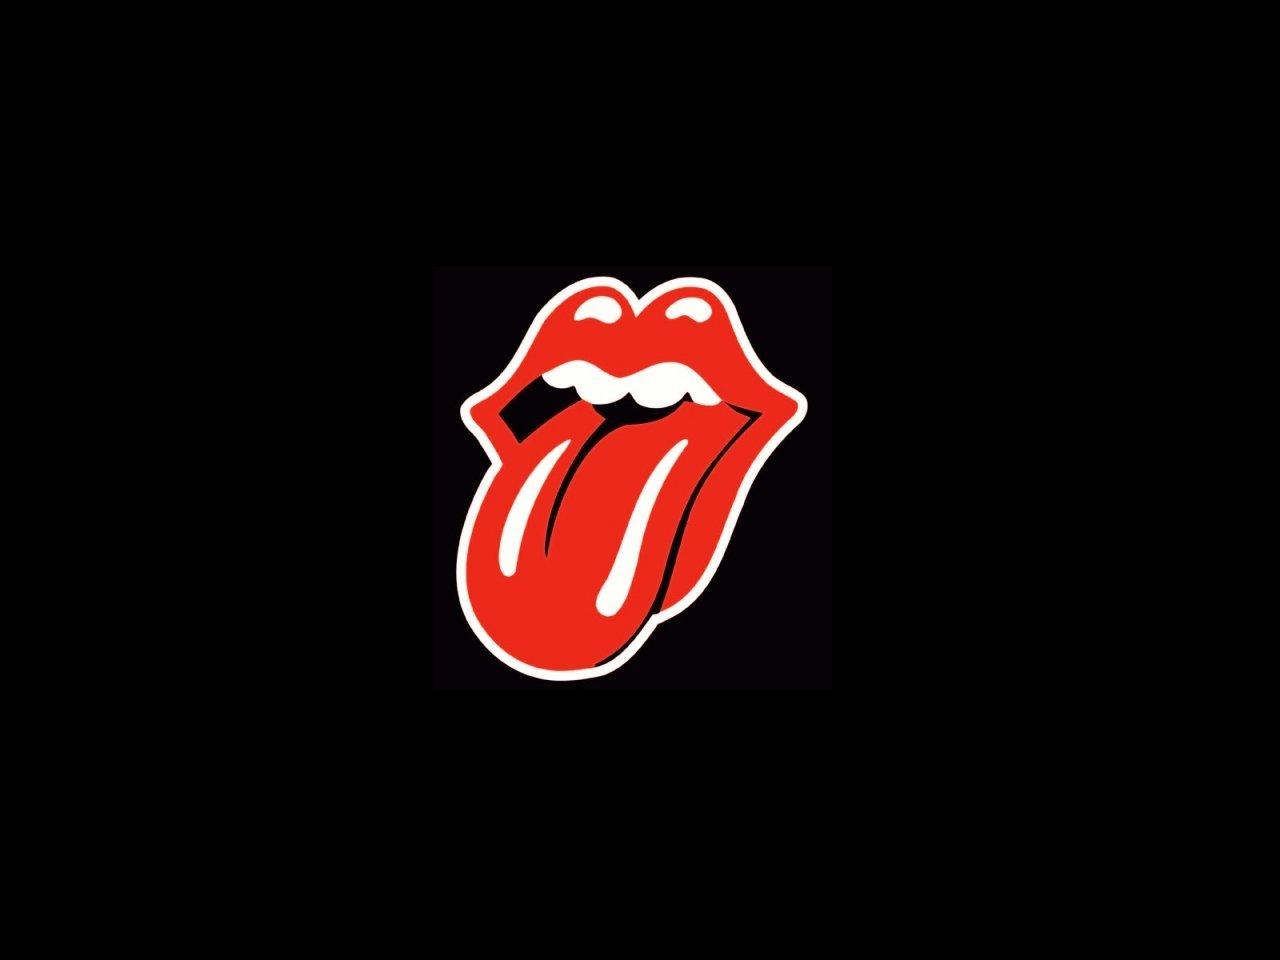 Rolling Stones Wallpaper Wallpapers Gallery 1280x960